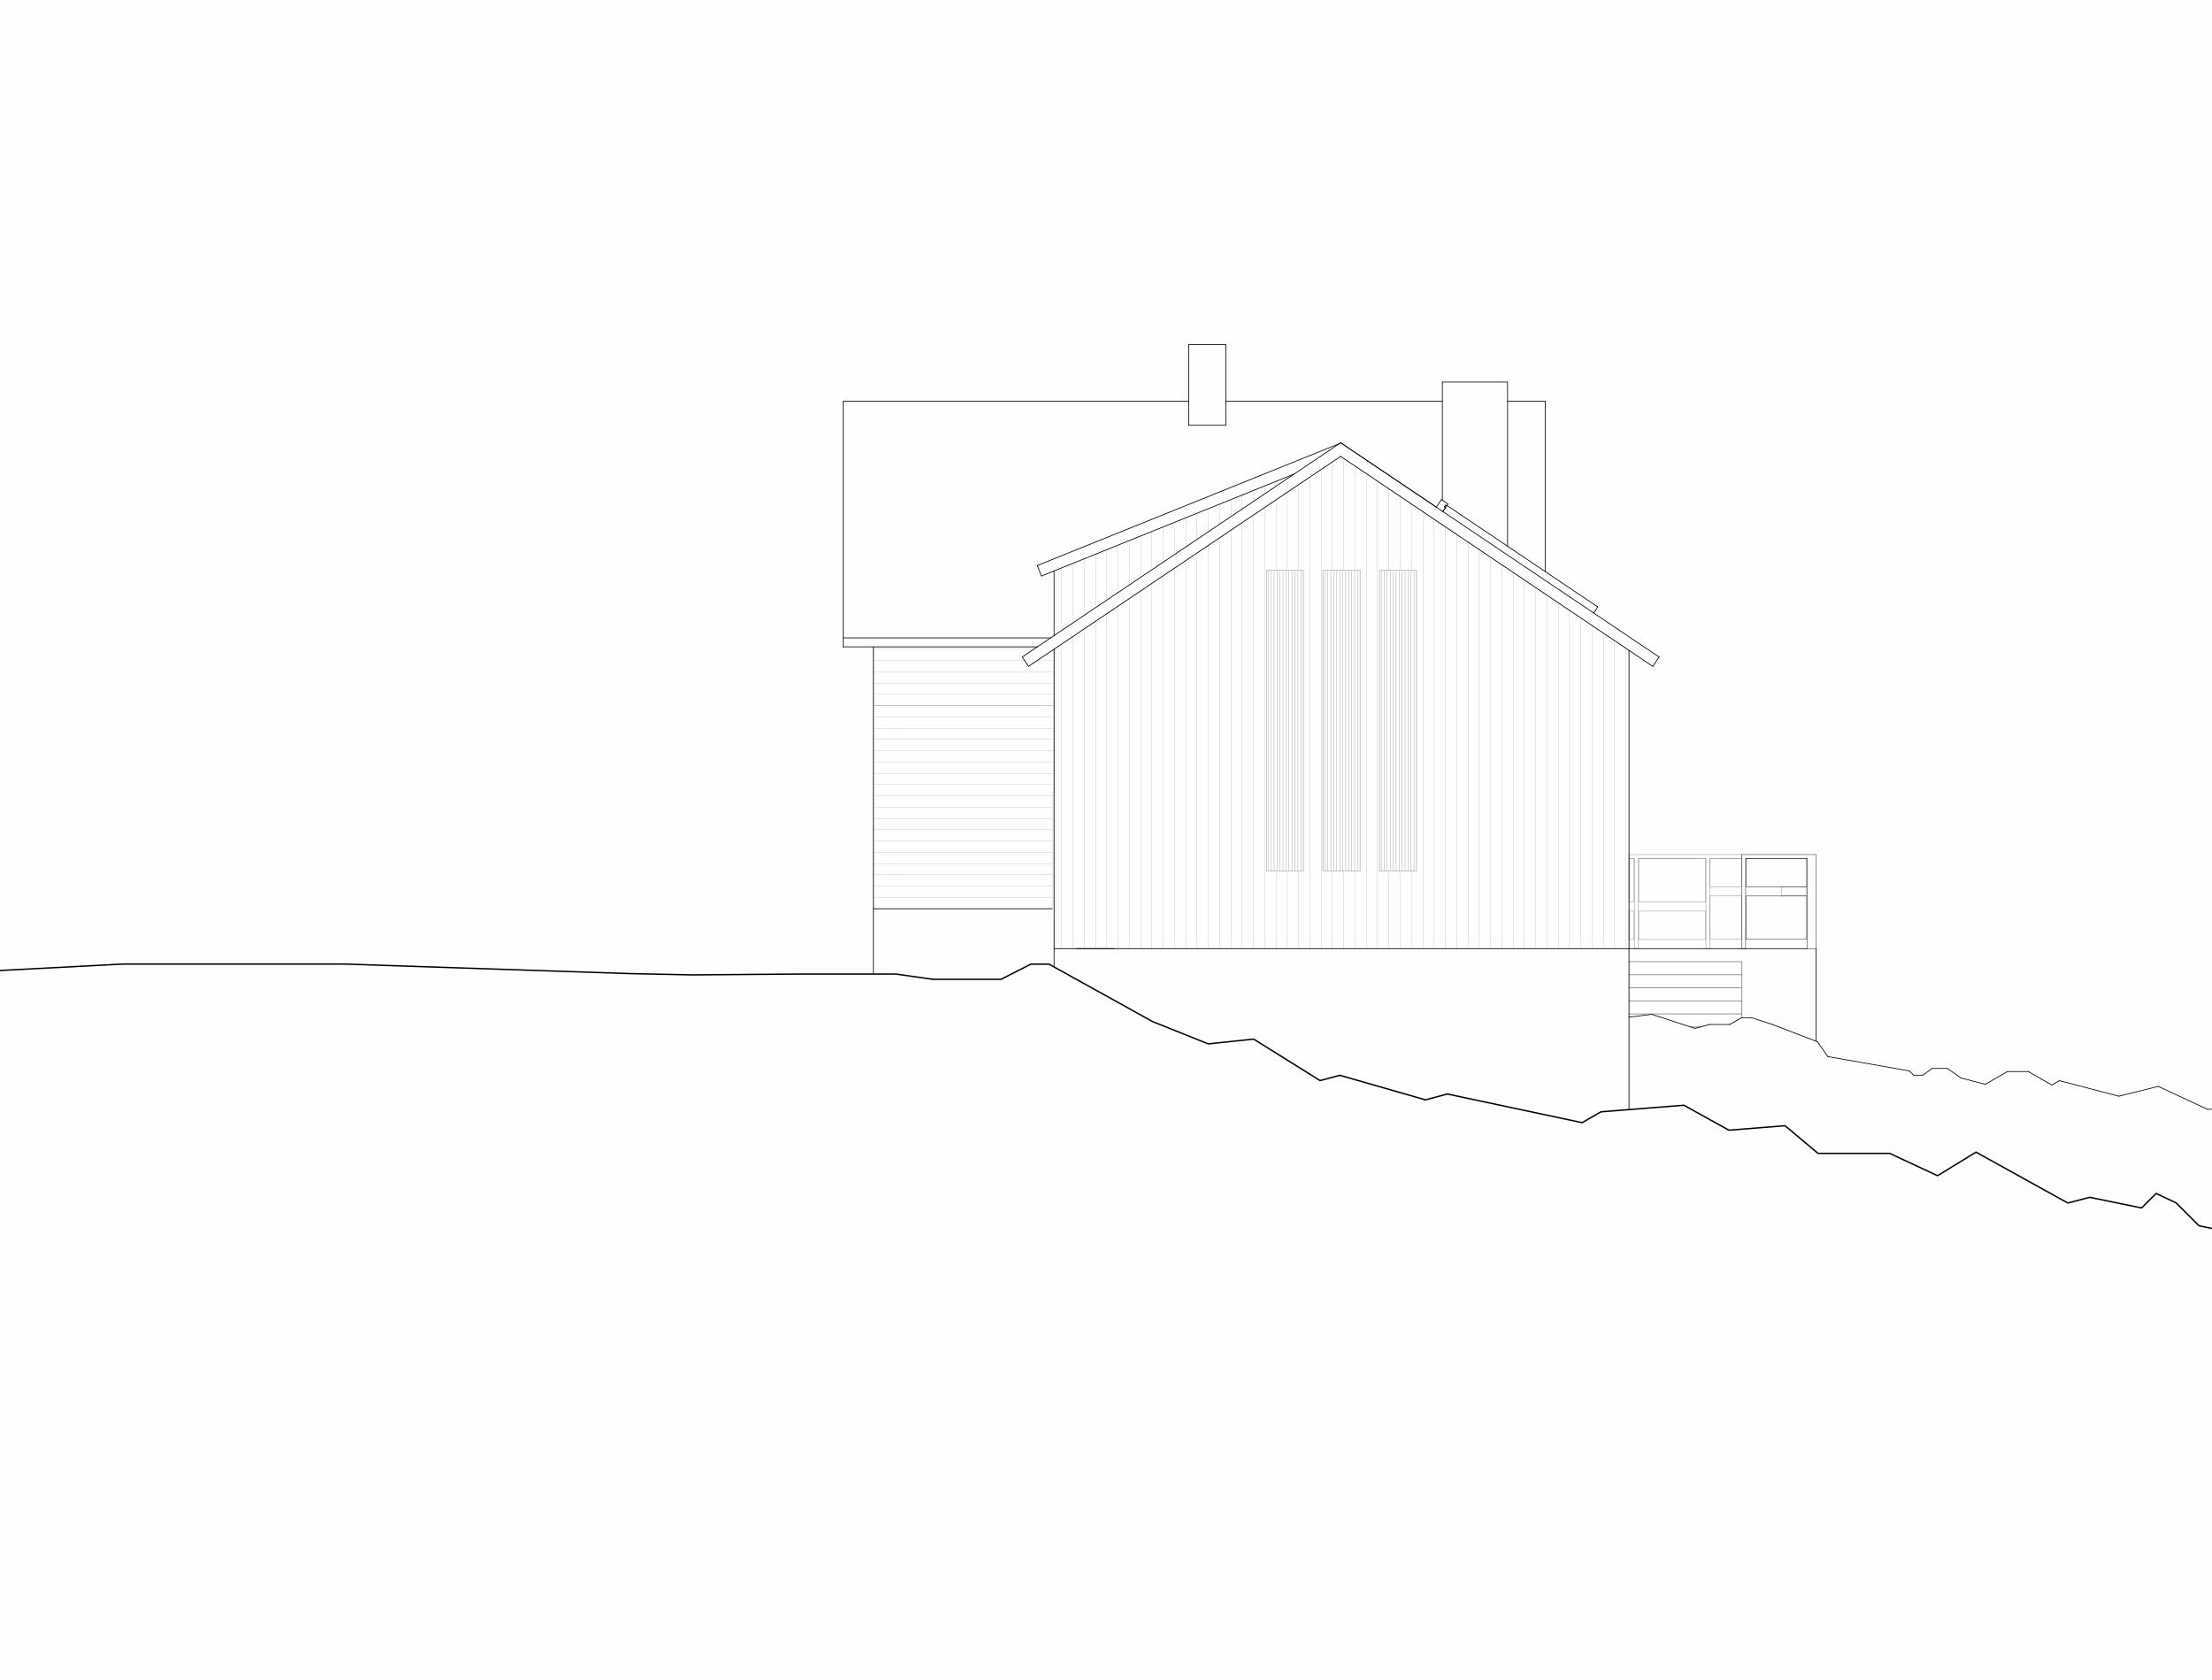 Forunderlig Arkitektur - 1604 - Fasade Nord